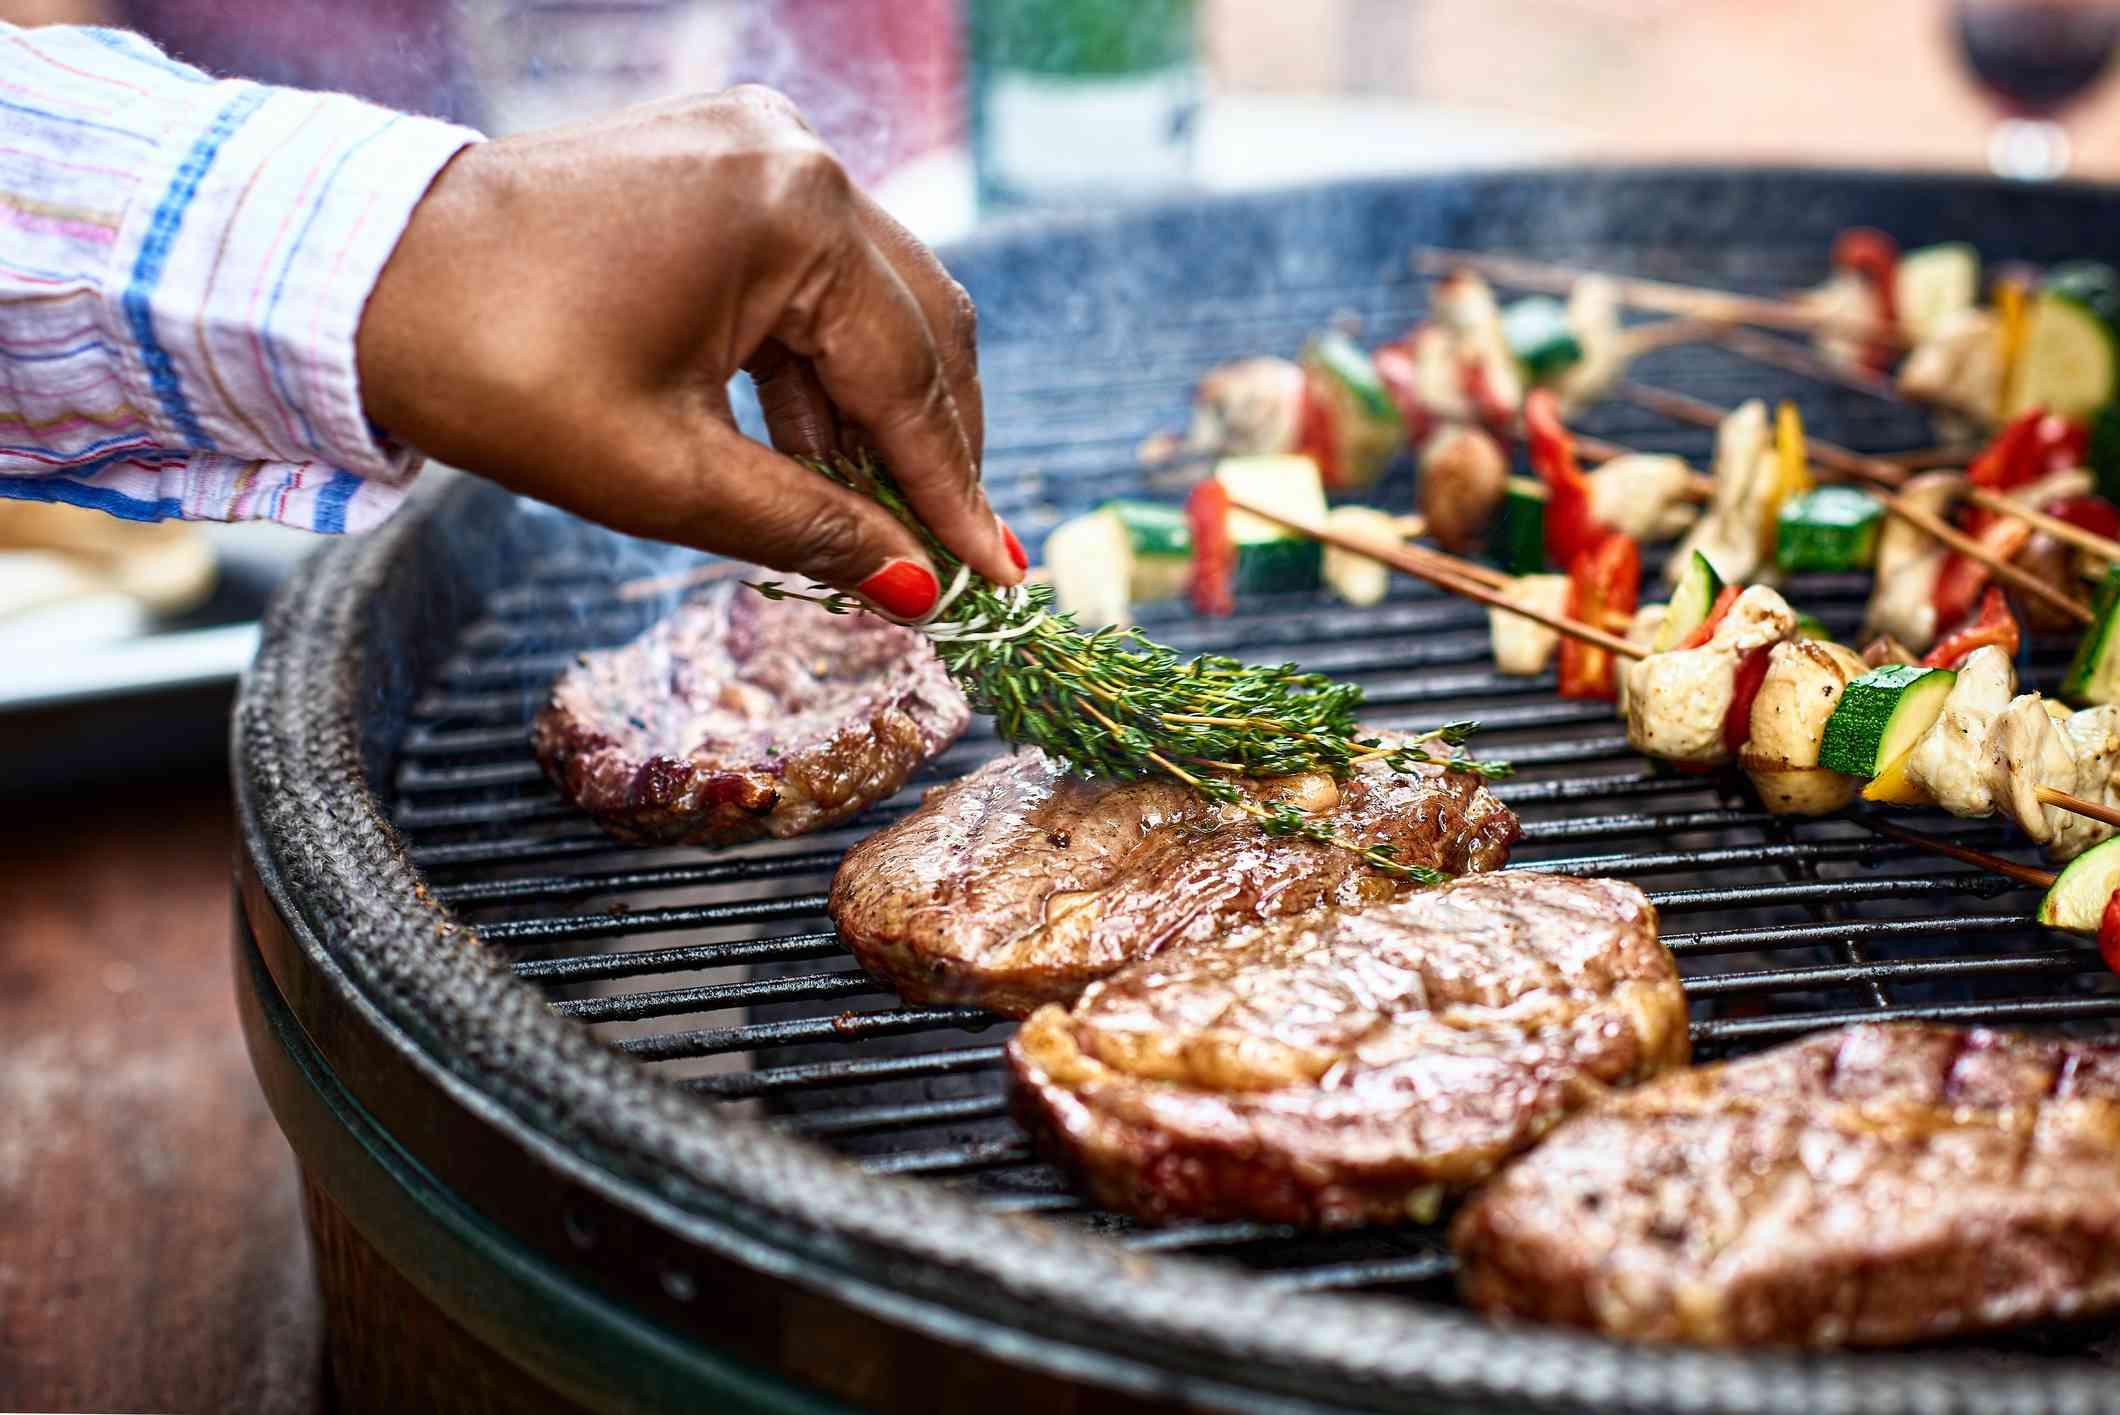 Woman's hand seasons steaks on a grill